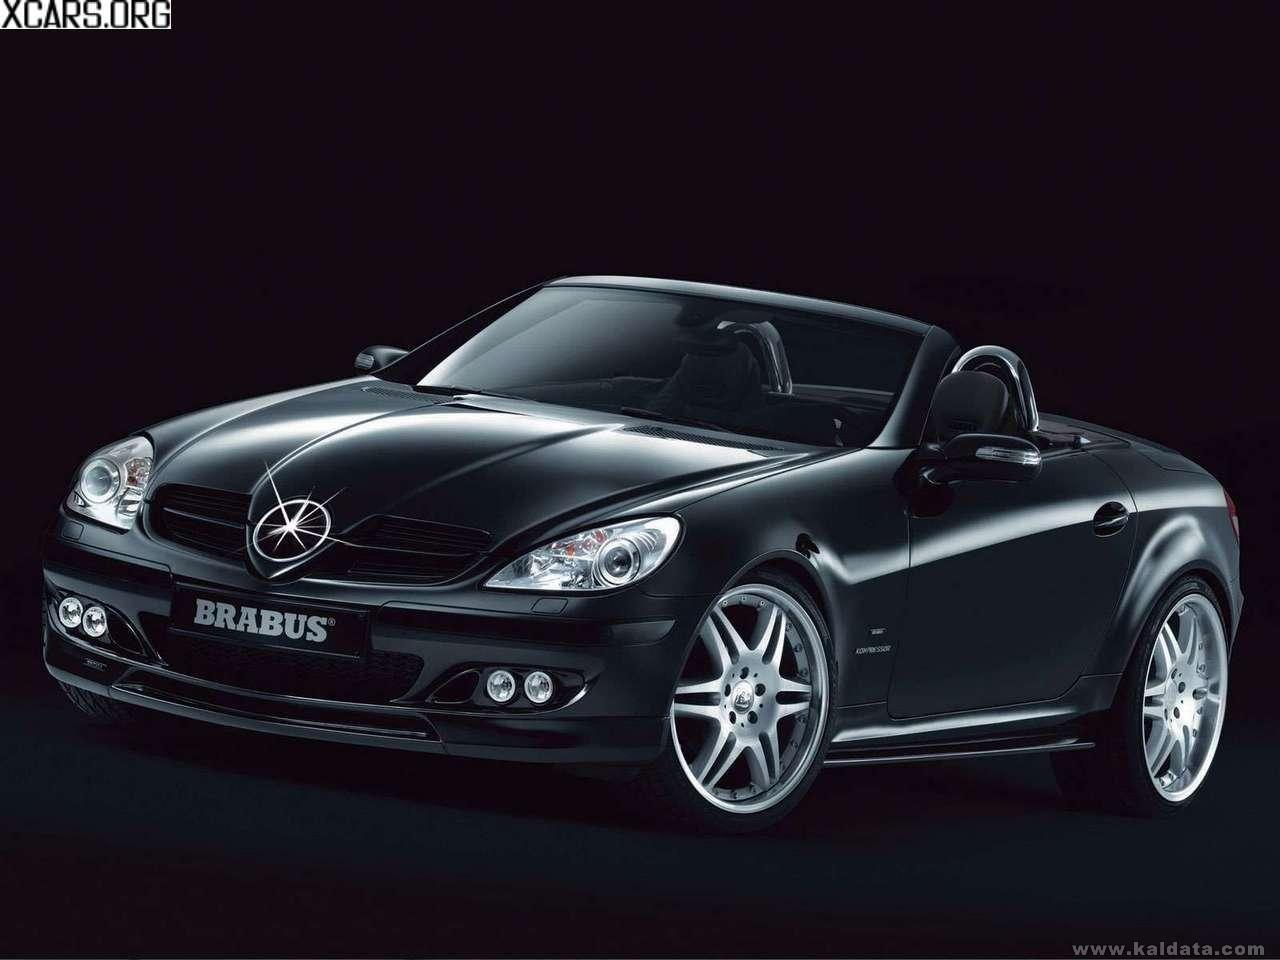 Brabus-Mercedes-Benz_SLK_2004